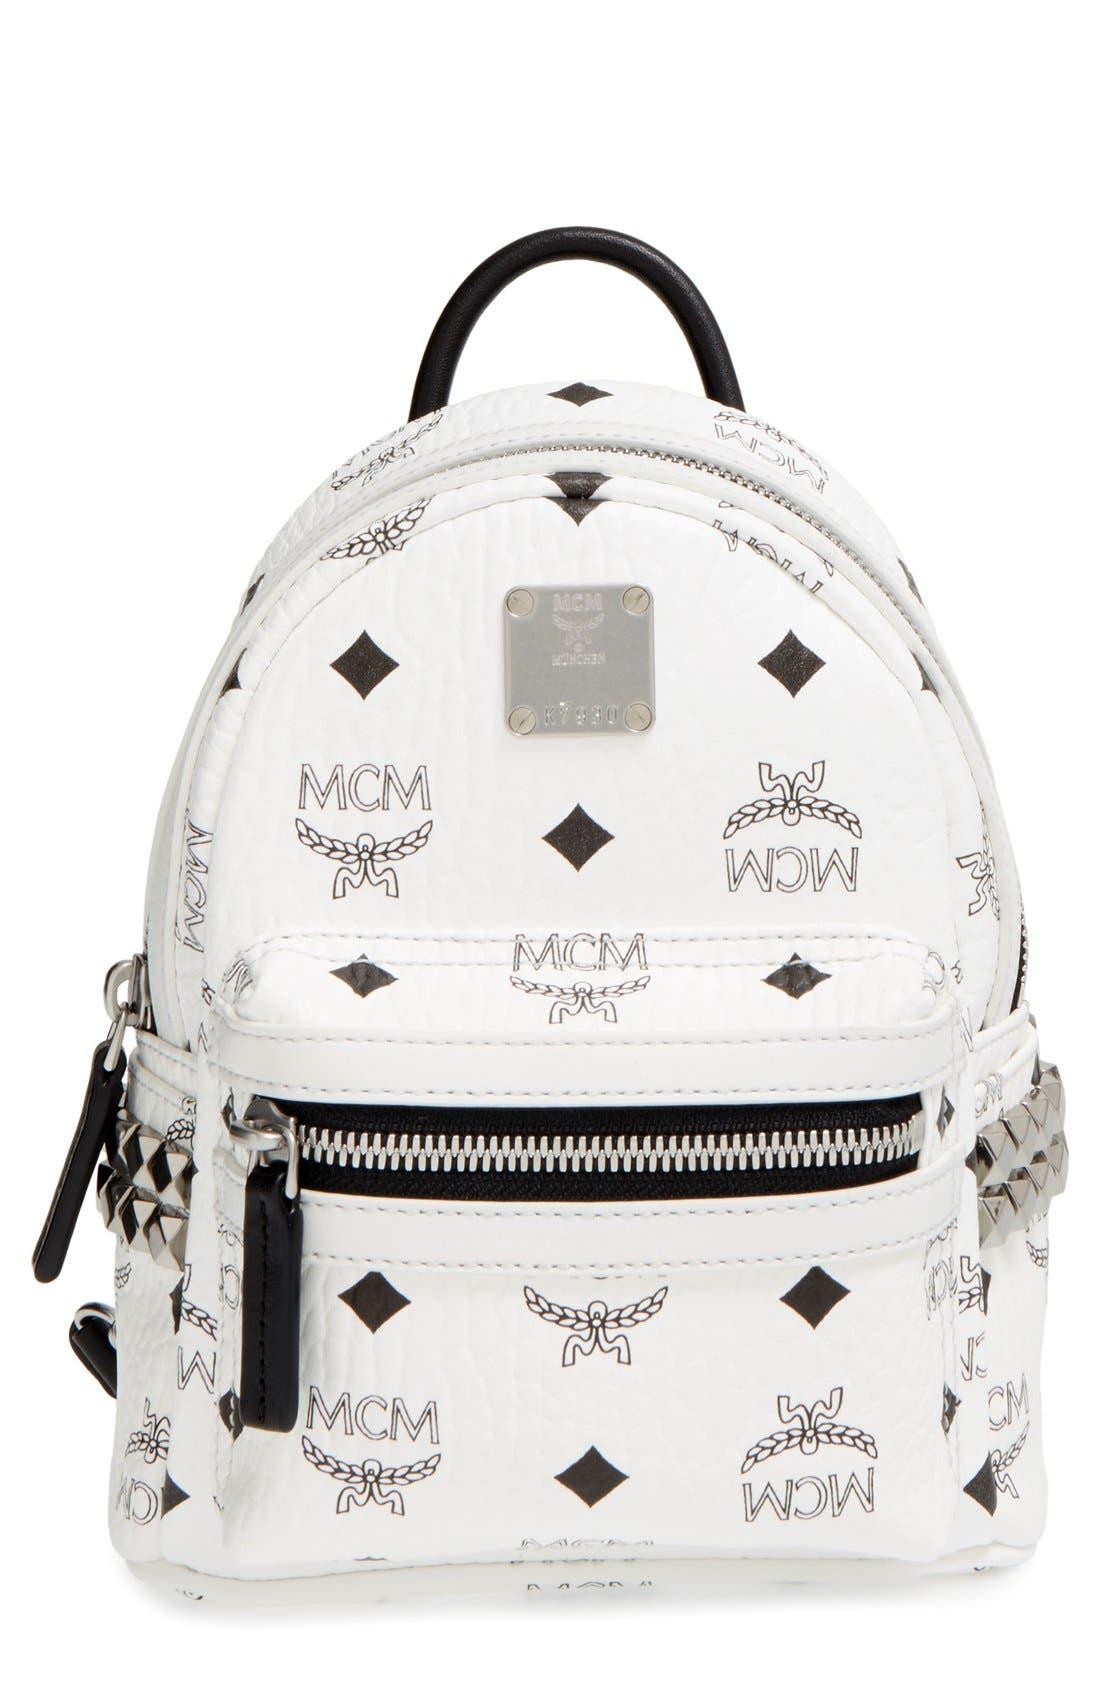 Alternate Image 1 Selected - MCM 'X-Mini Stark Side Stud' Convertible Backpack